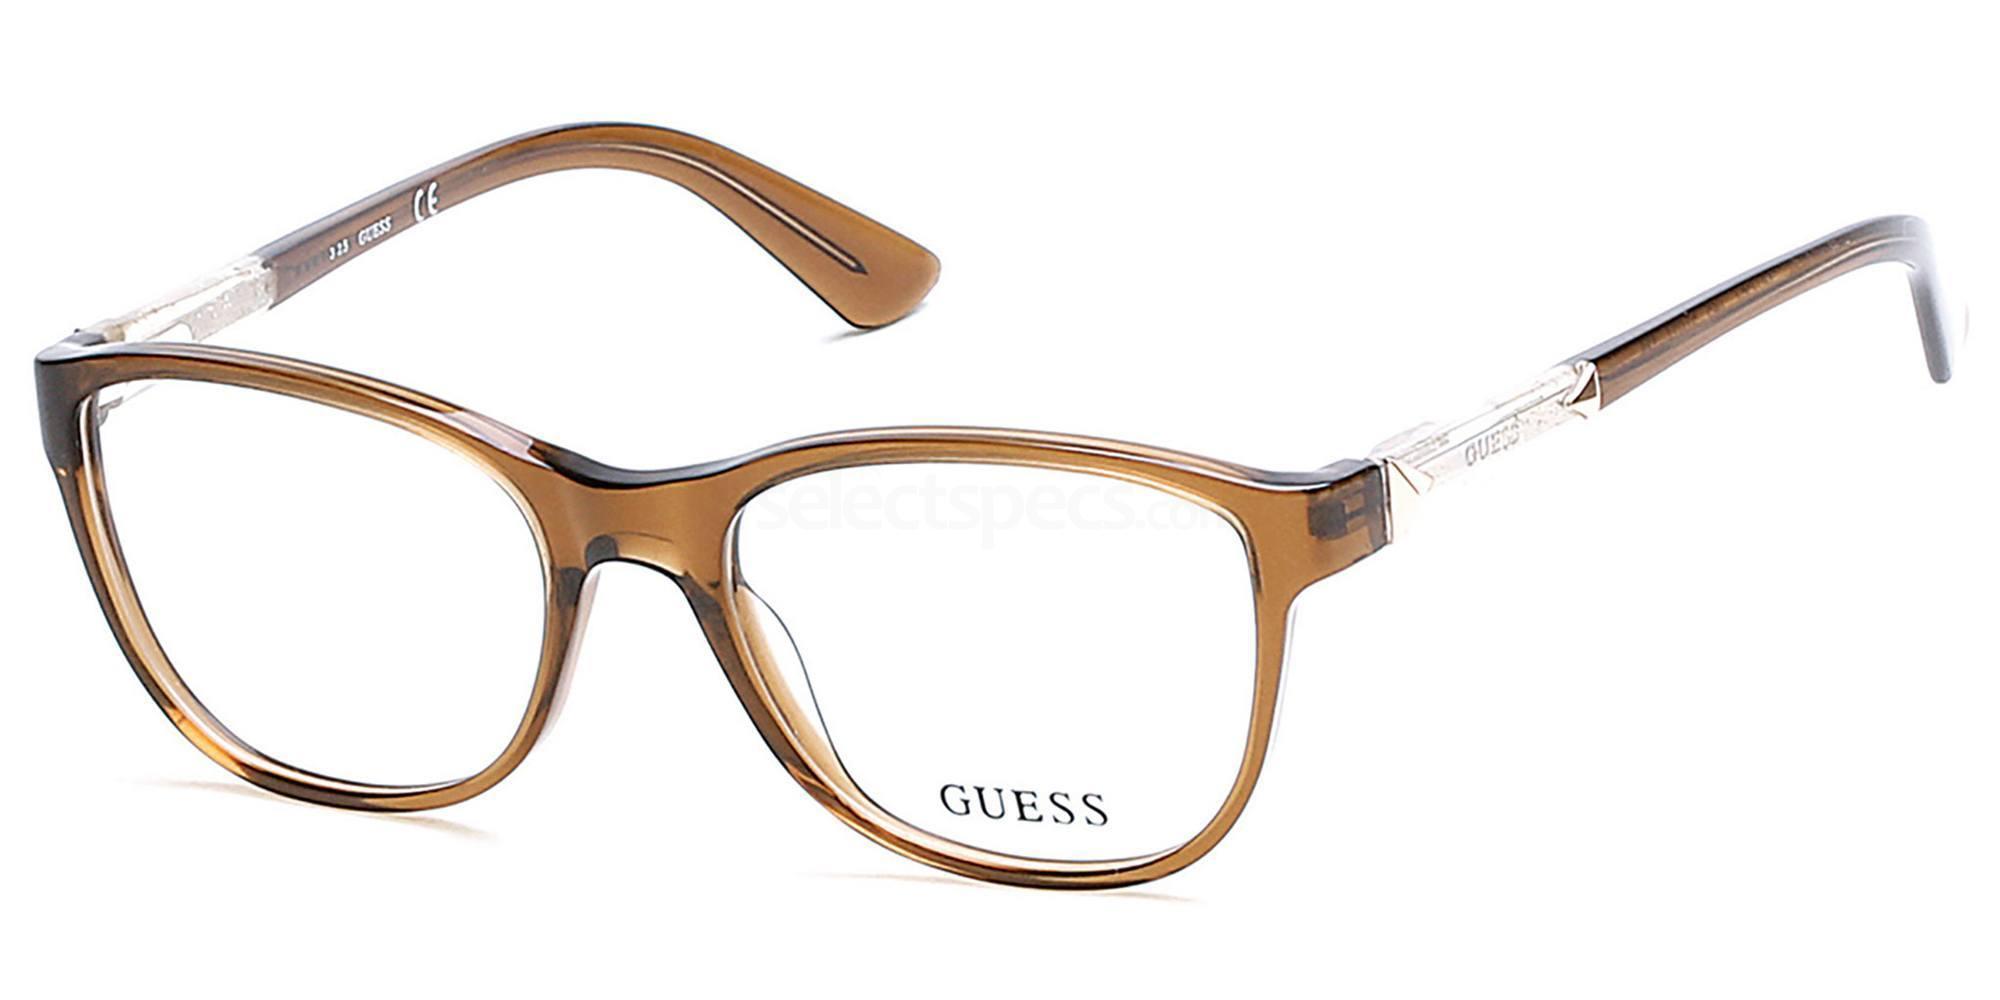 045 GU2562 Glasses, Guess